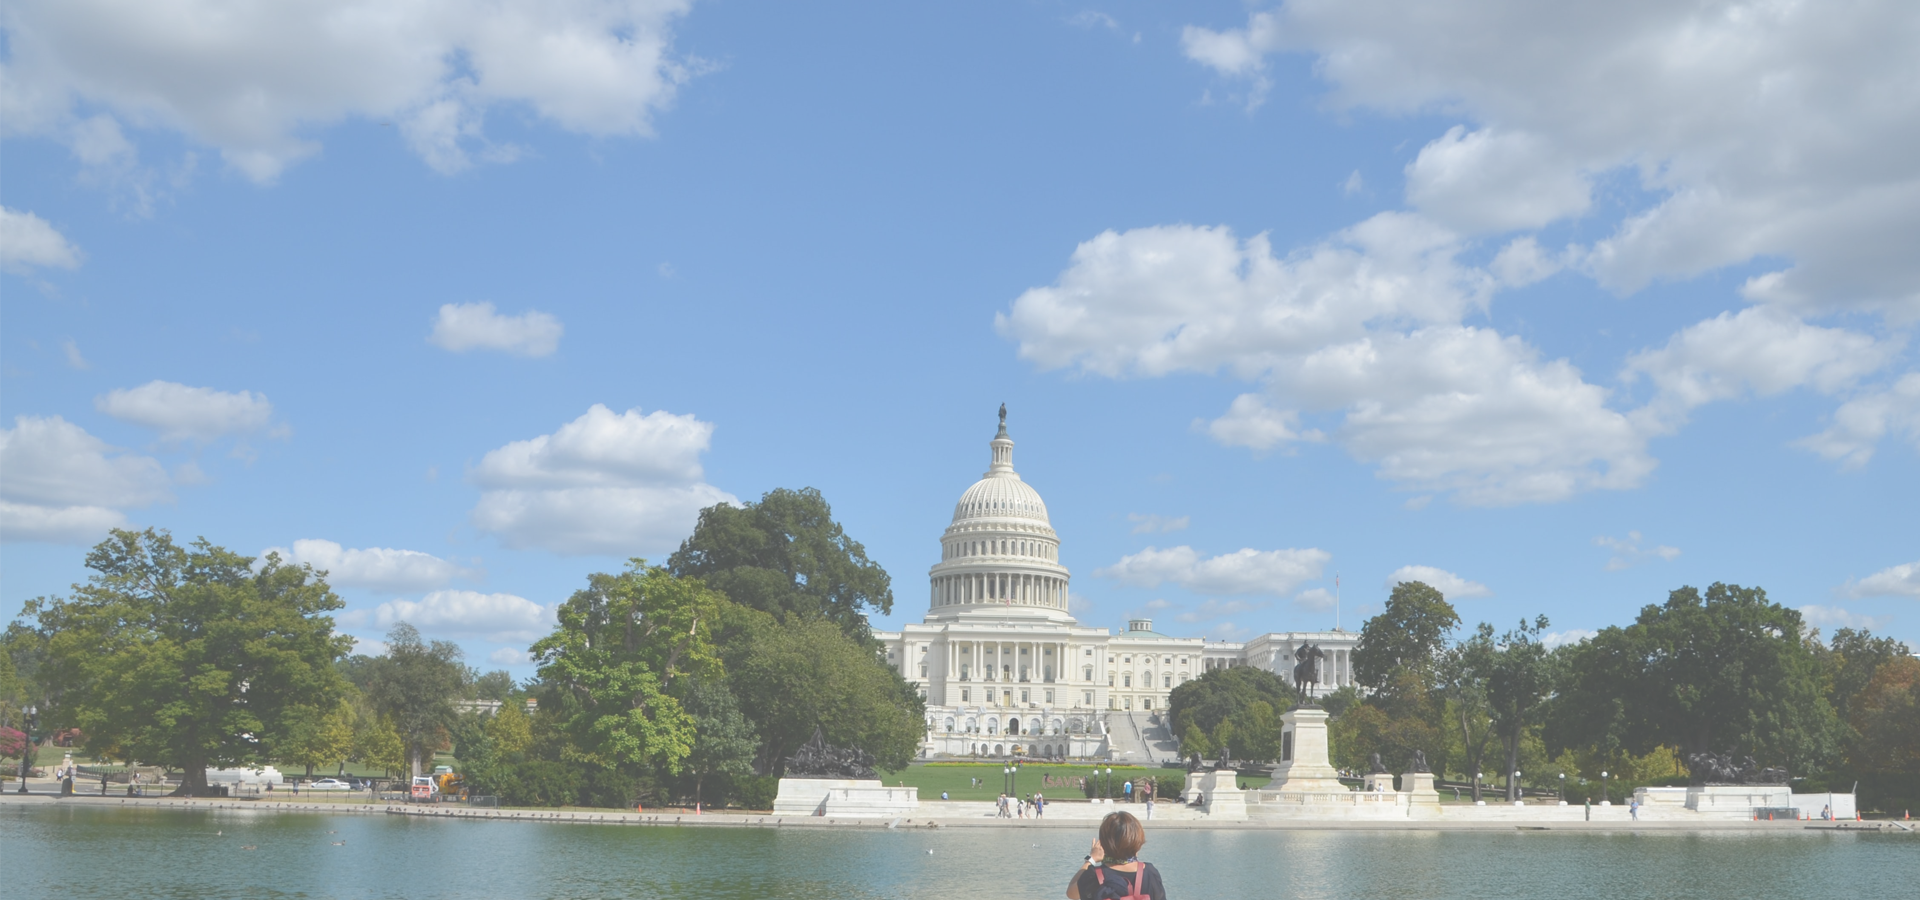 Peer-to-peer advisory in Washington D.C., District of Columbia, USA